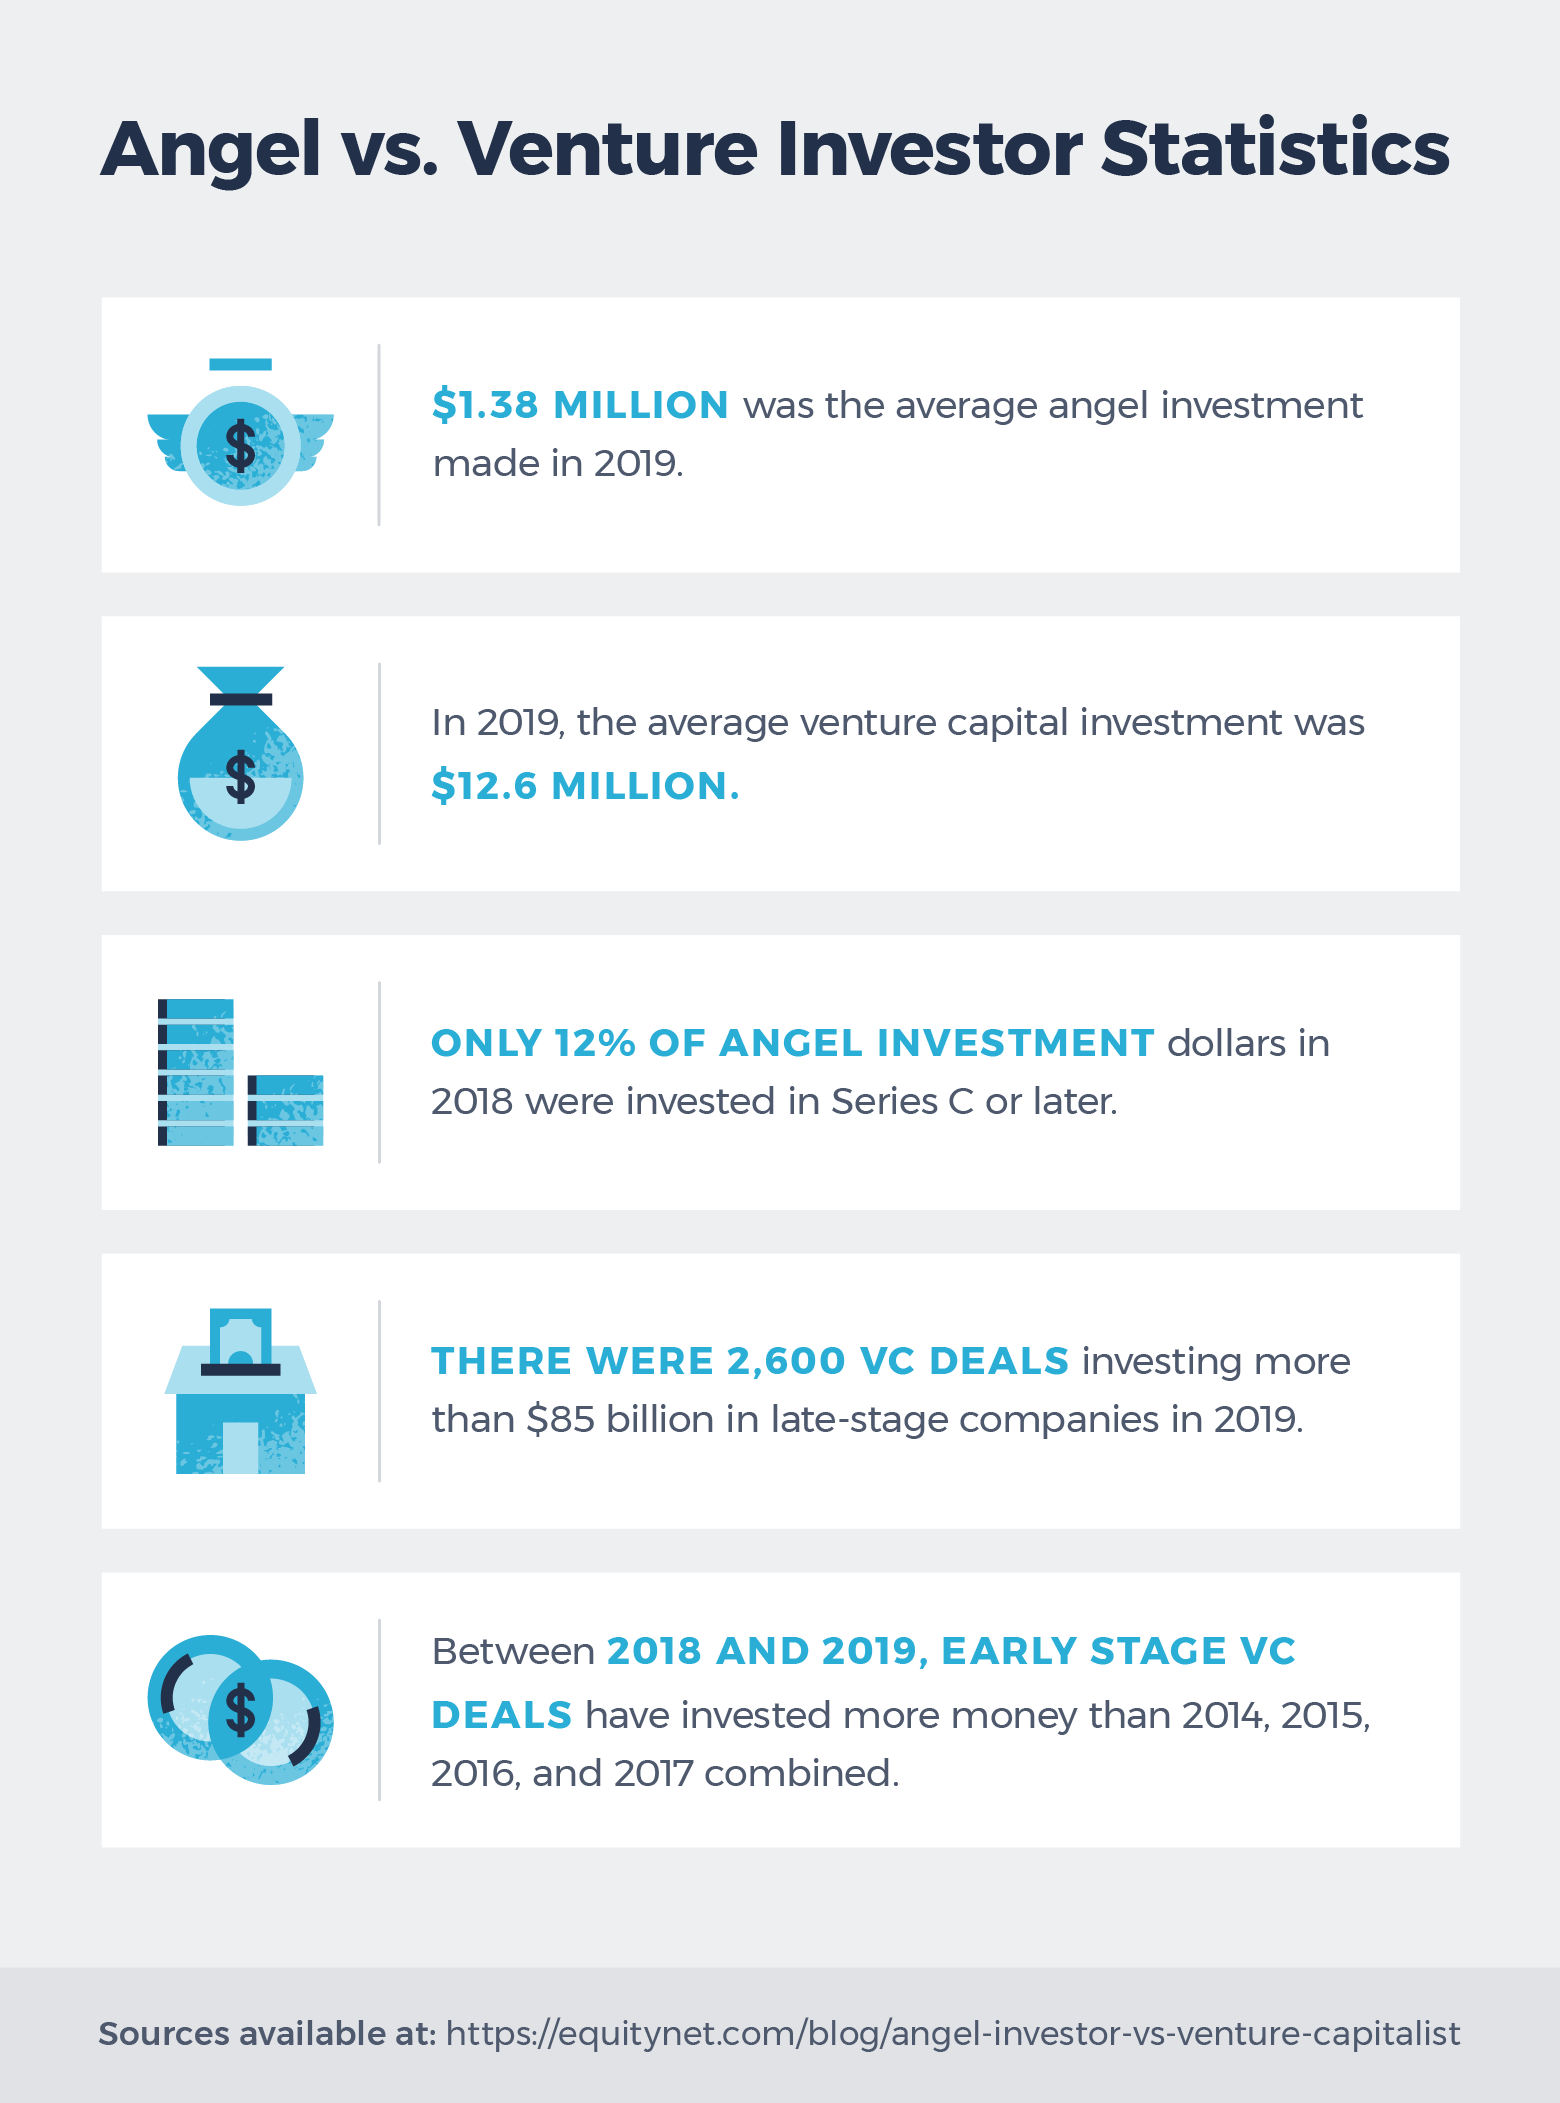 angel investor vs. venture capitalist statistics 2020